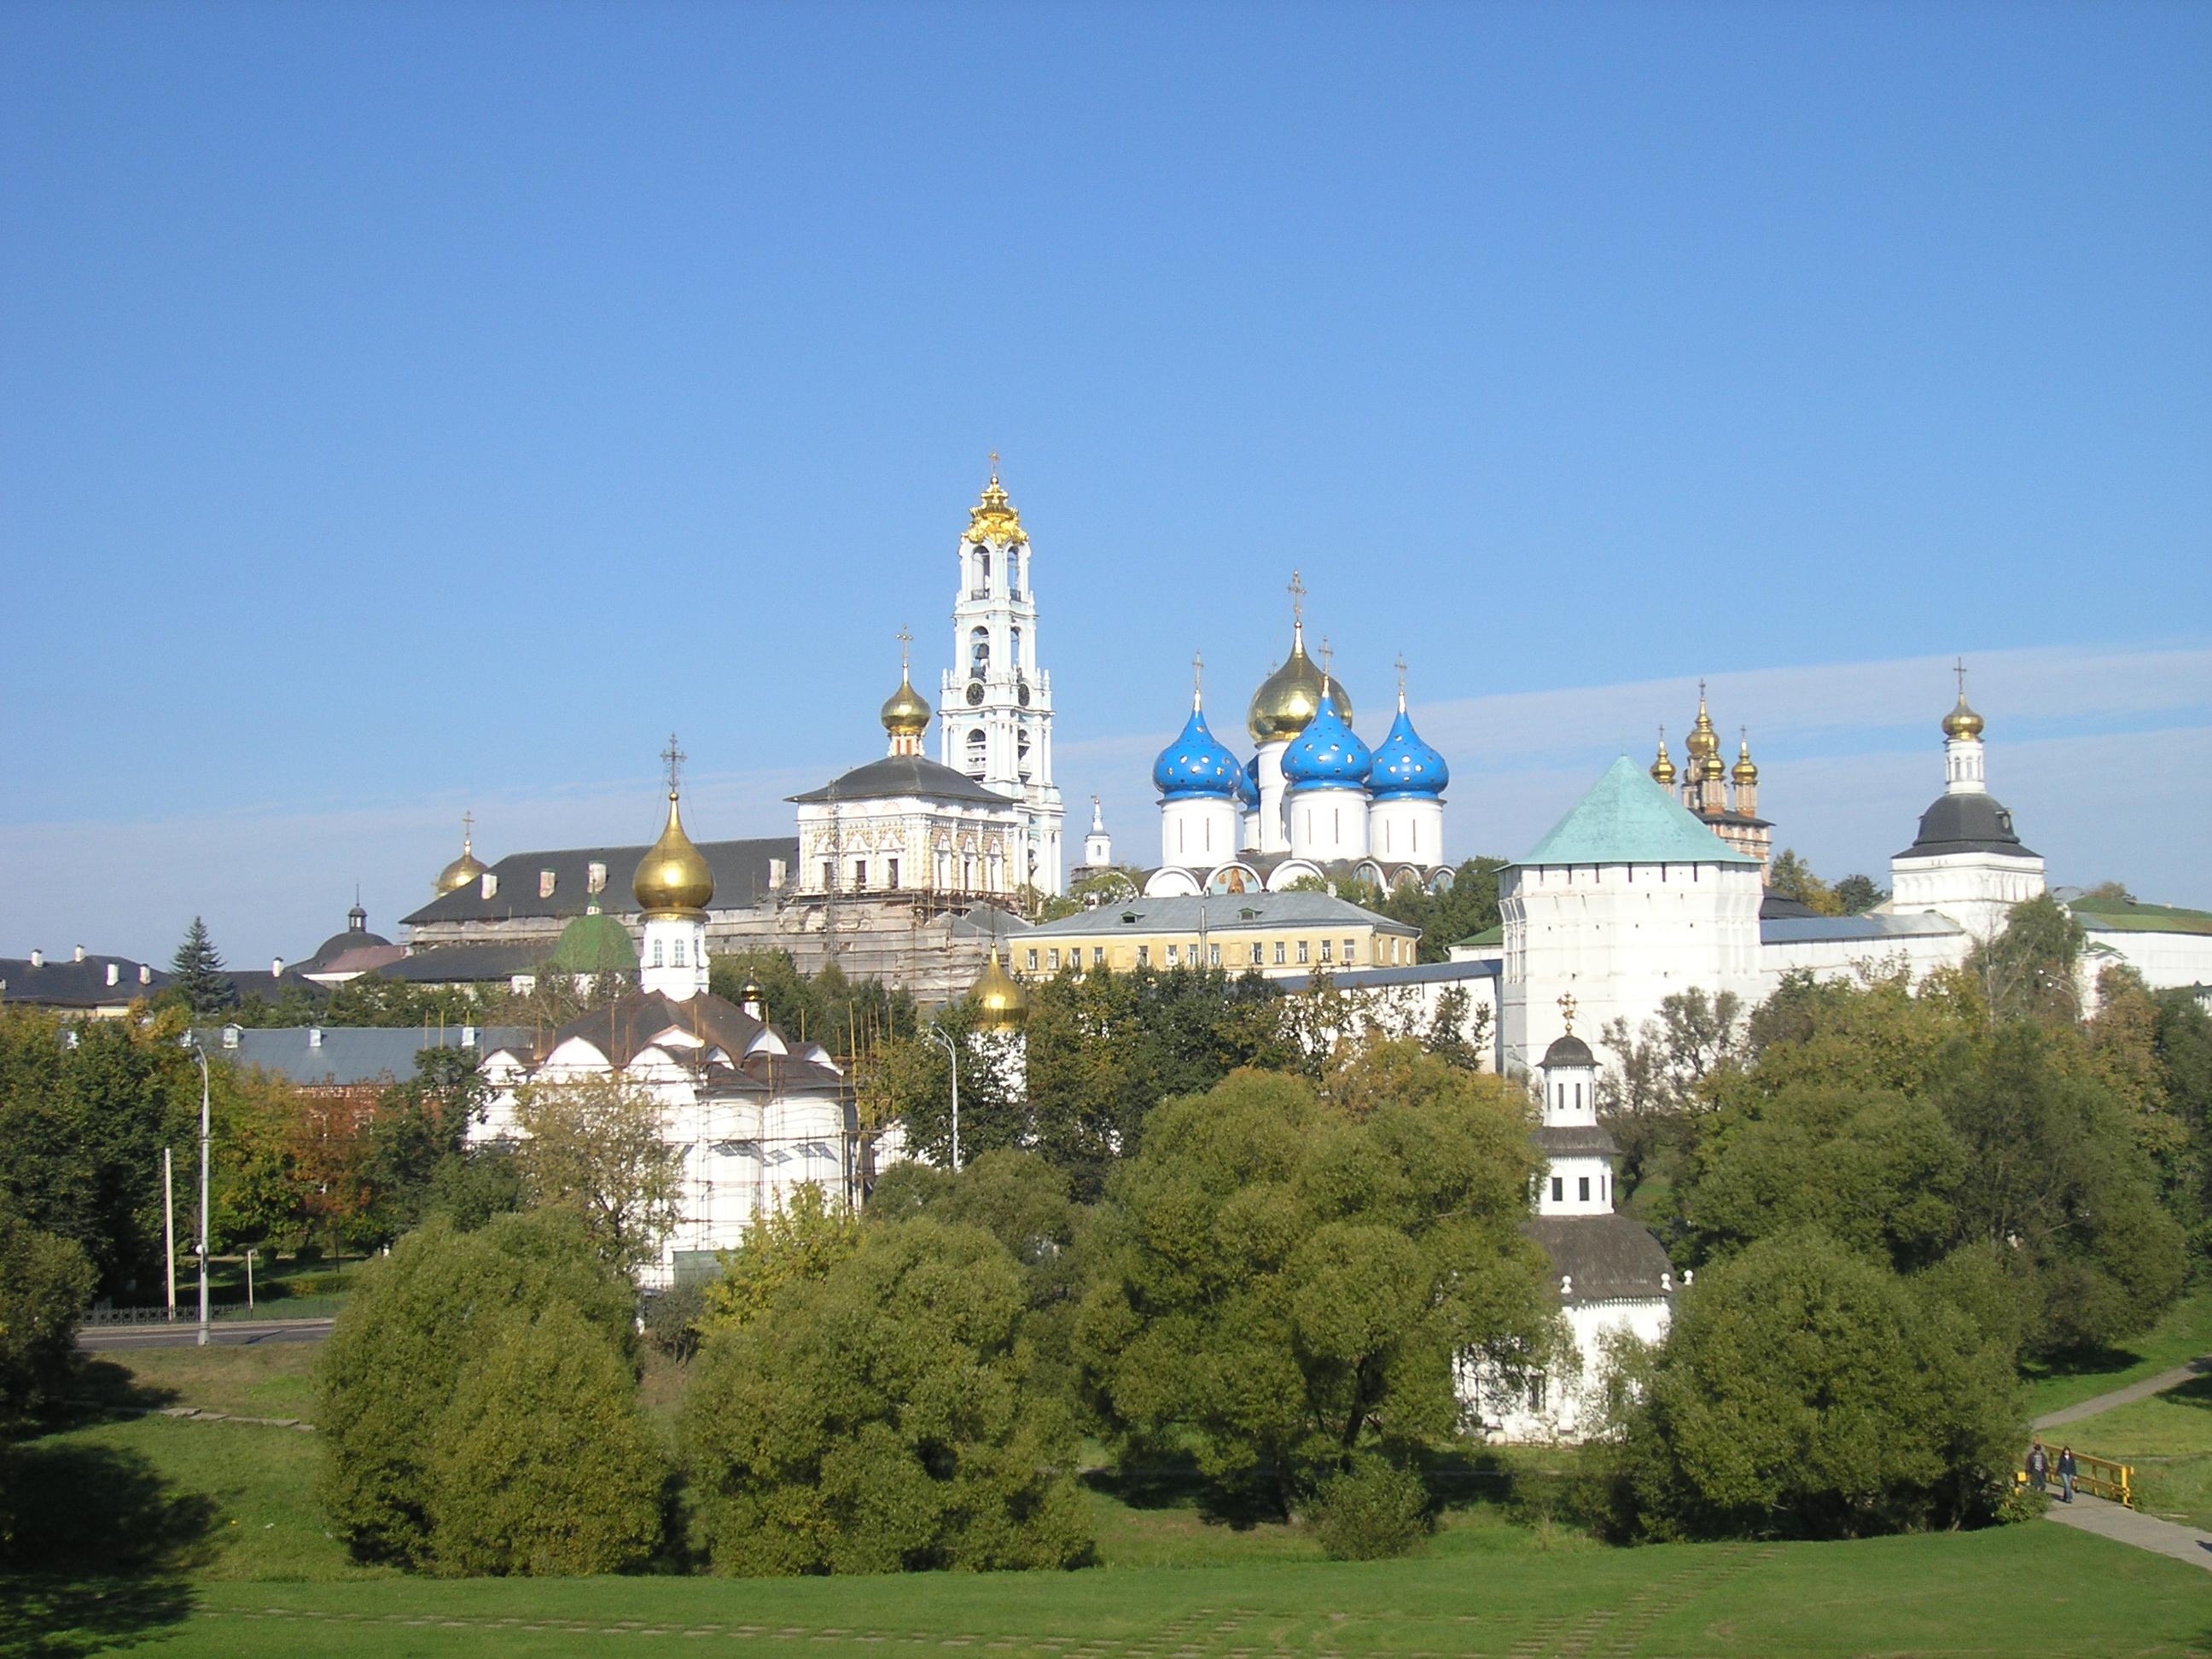 https://upload.wikimedia.org/wikipedia/commons/c/c9/Russia-Sergiev_Posad-Troitse-Sergiyeva_Lavra-Panorama-5.jpg